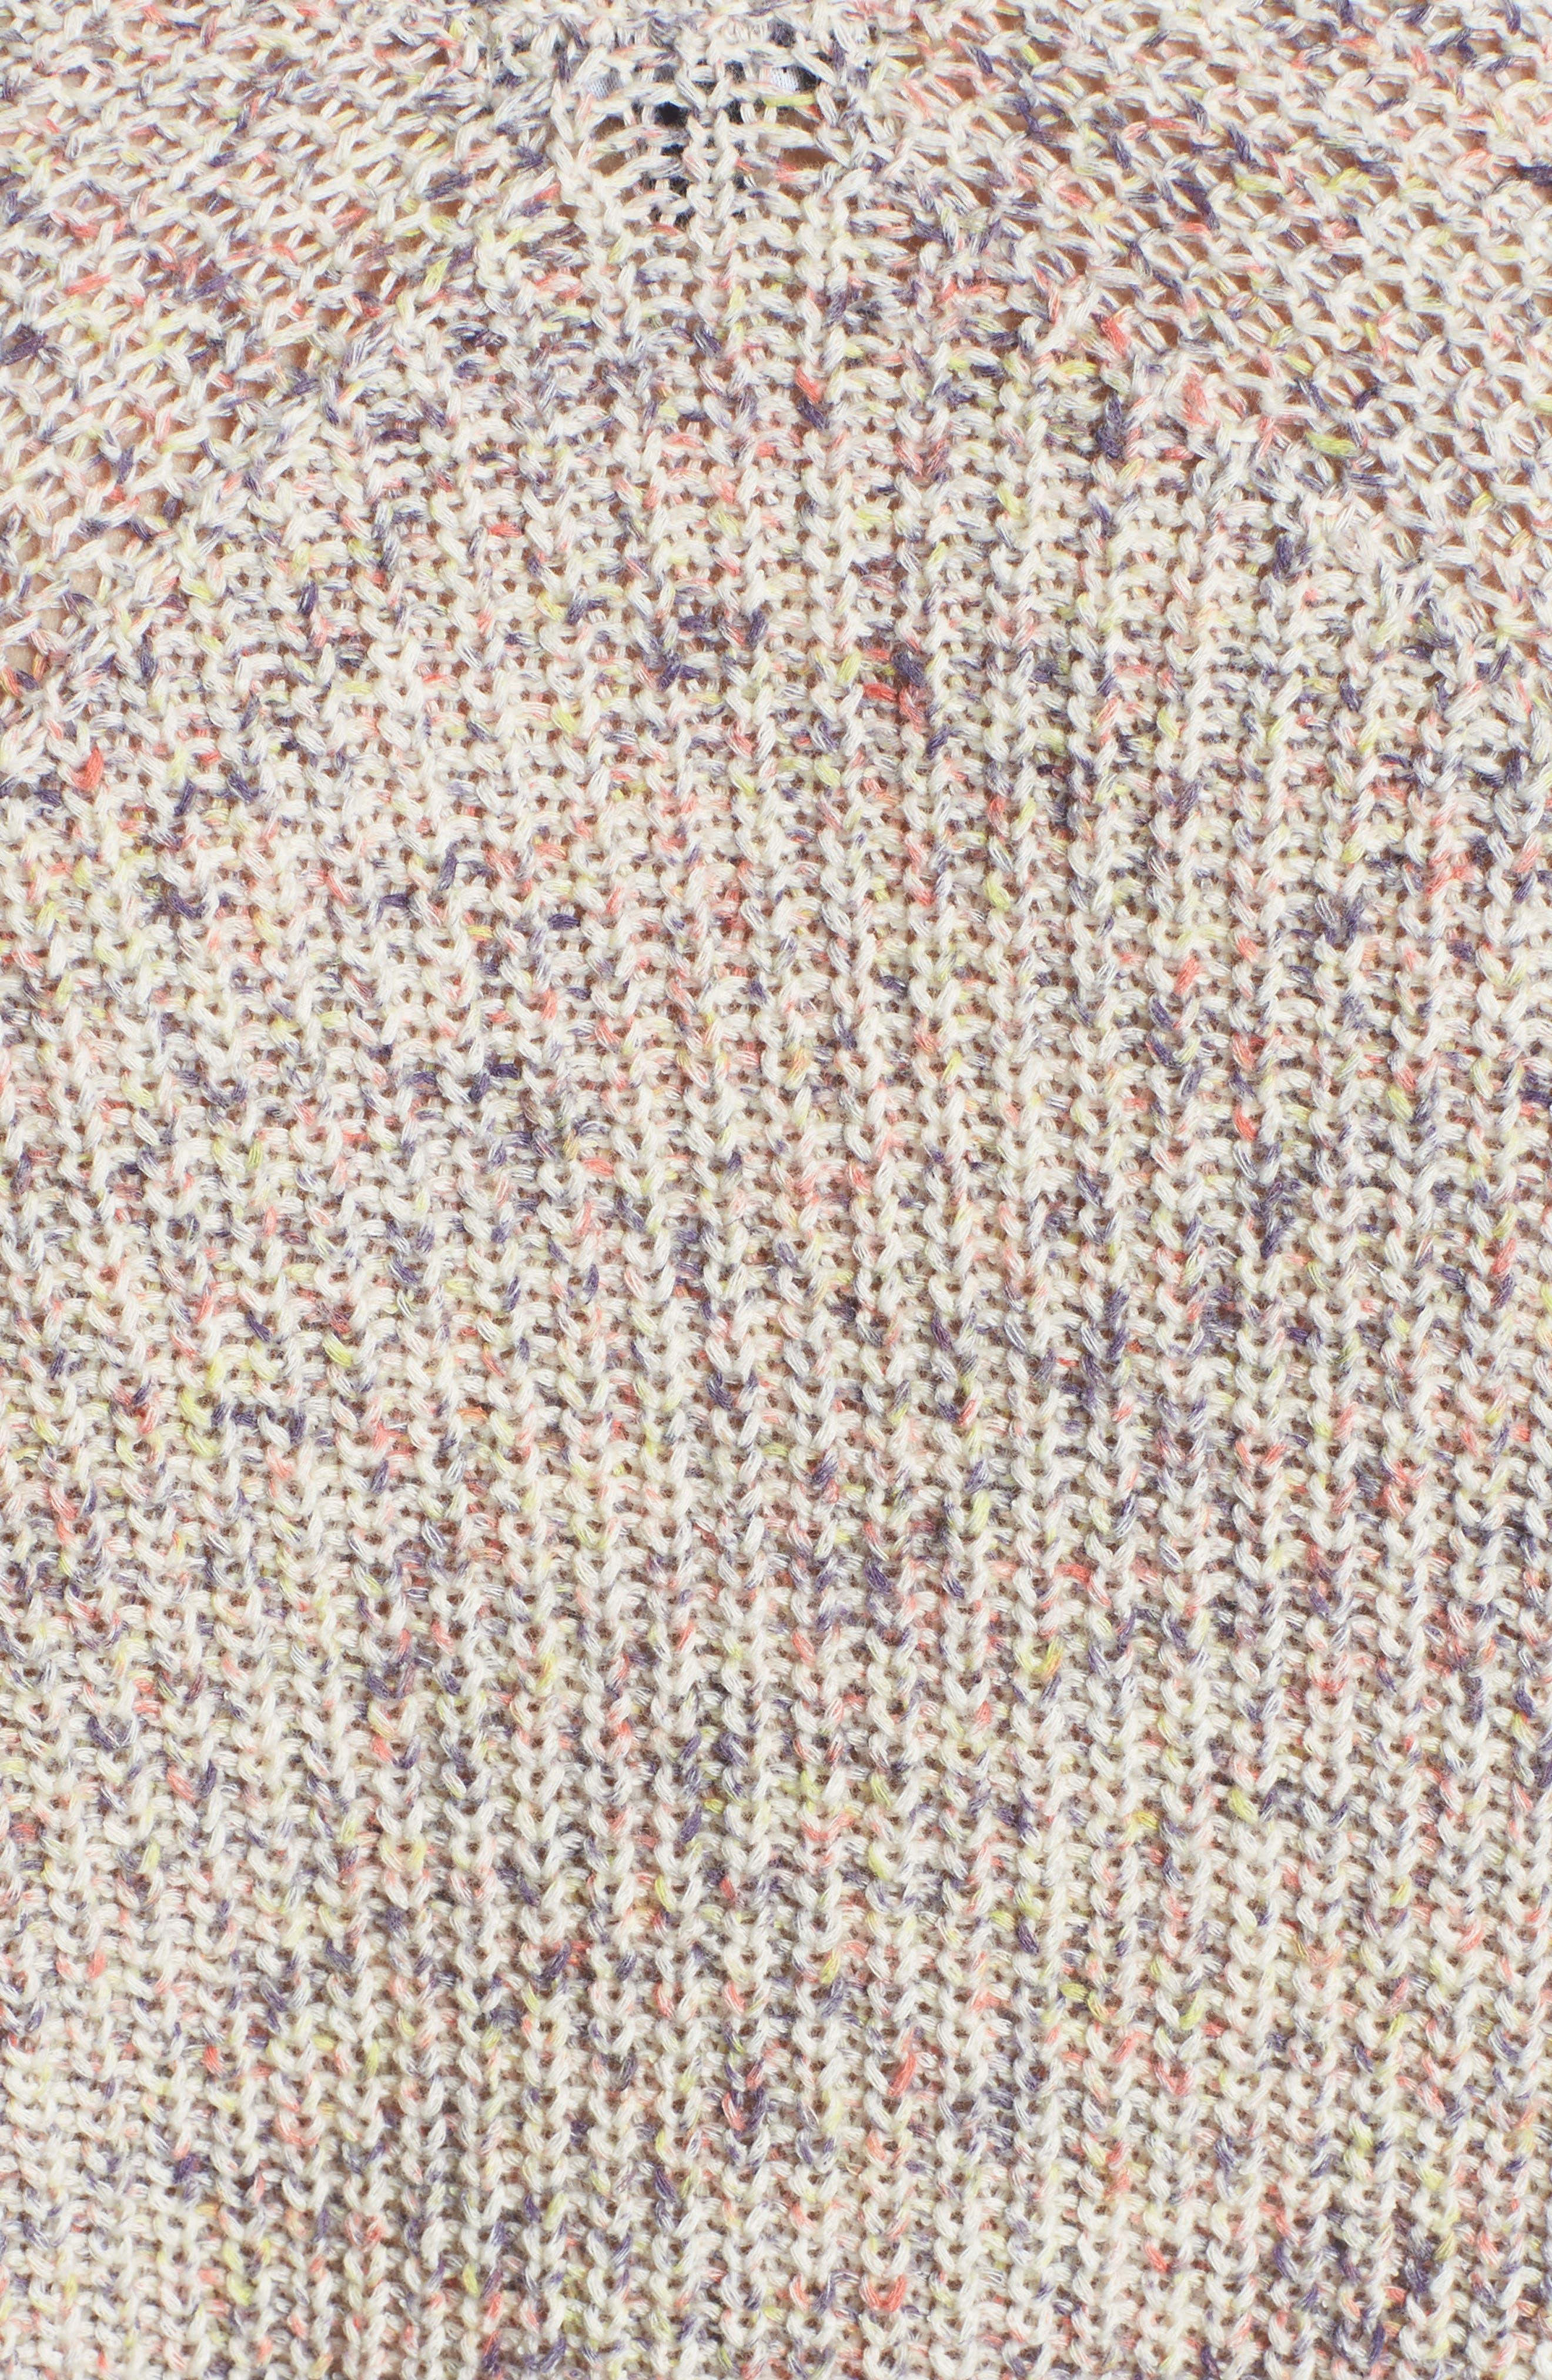 Plunging Crisscross Sweater,                             Alternate thumbnail 6, color,                             Glow Multi